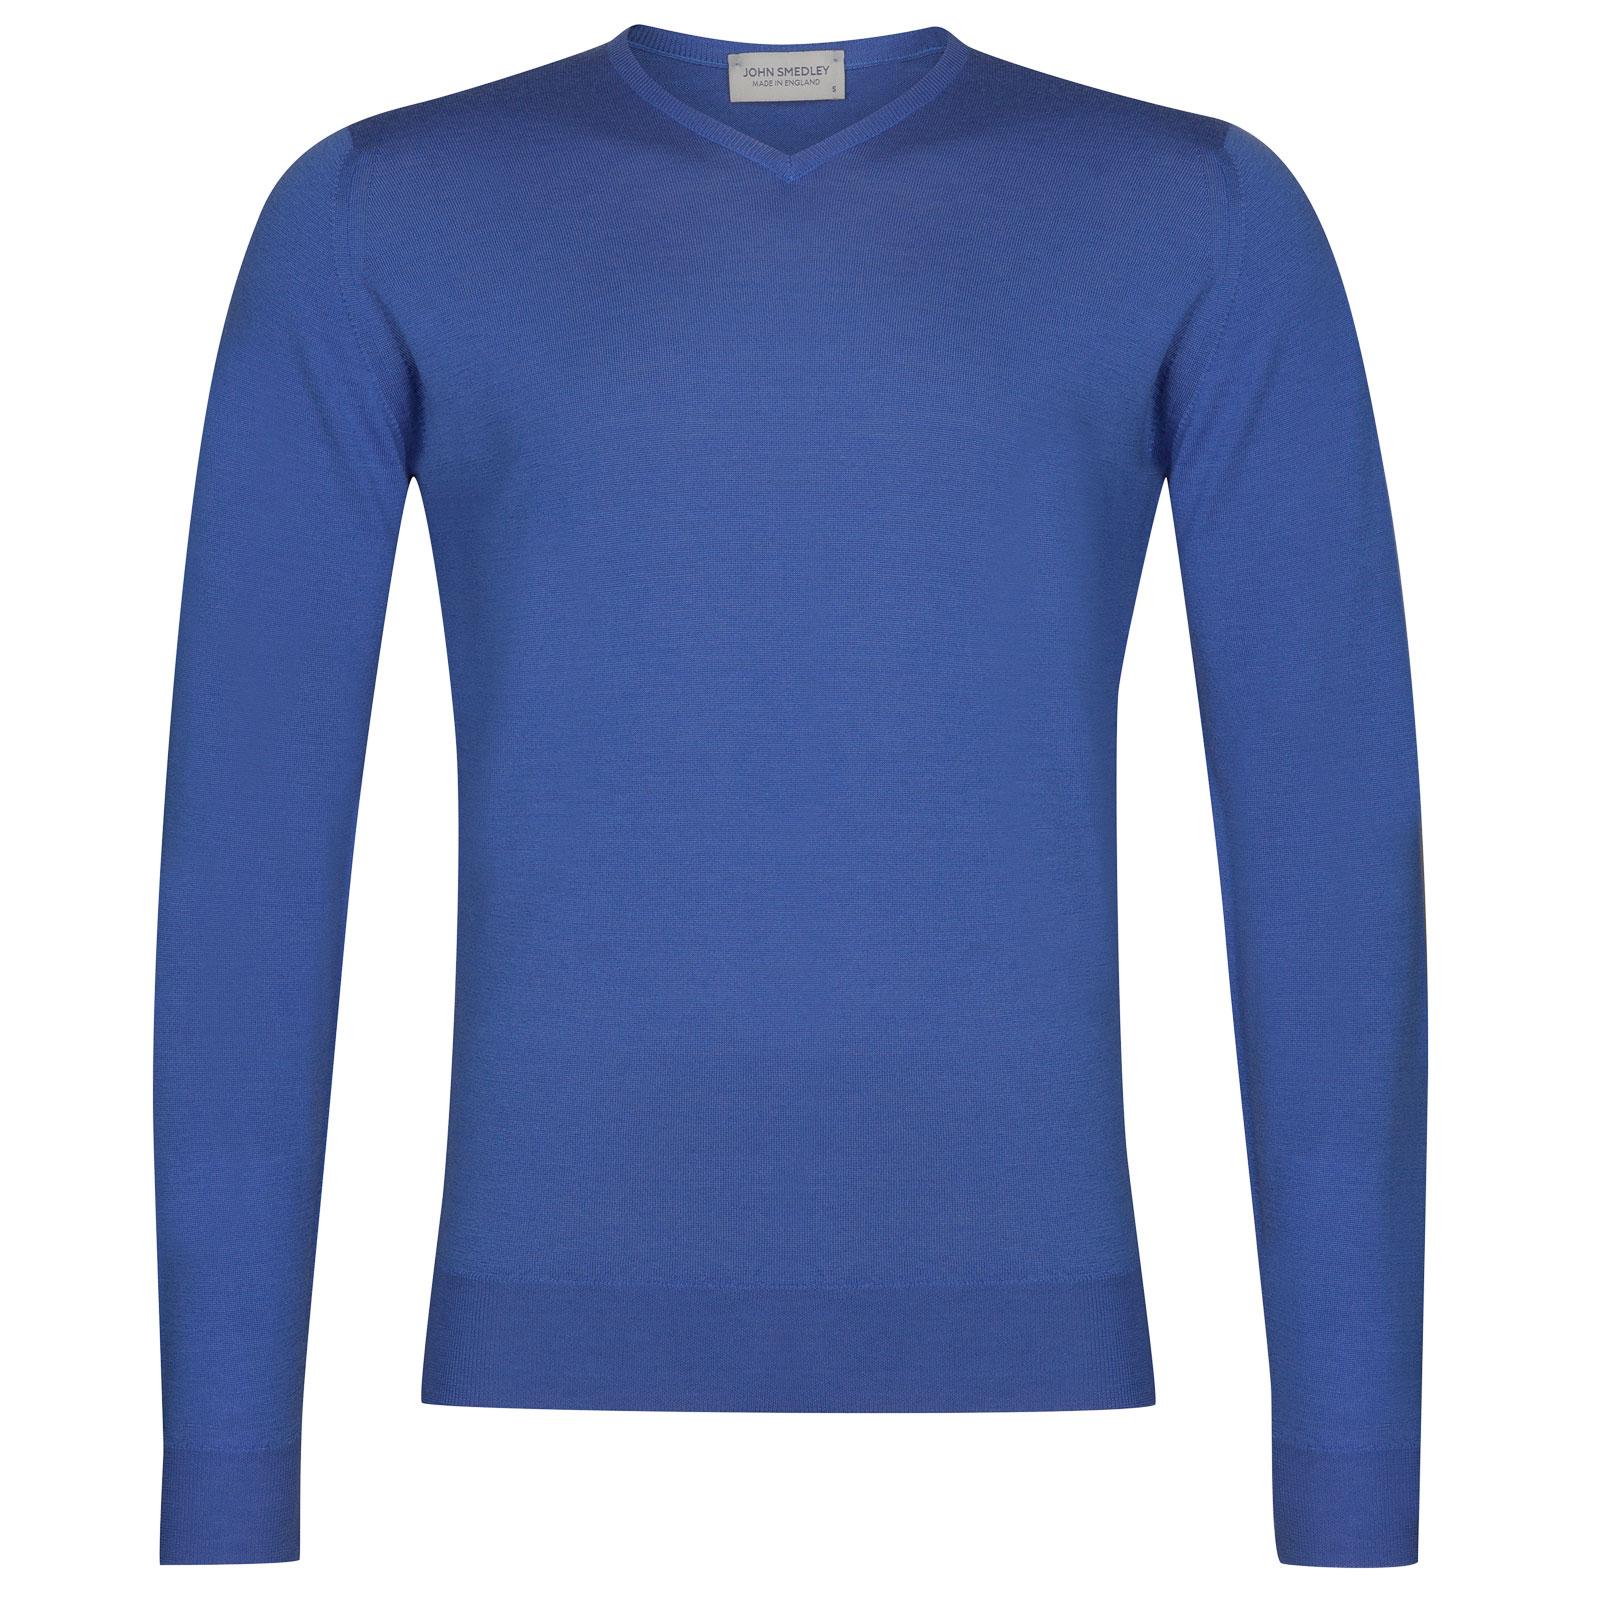 John Smedley Shipton Merino Wool Pullover in Chambray Blue-XL